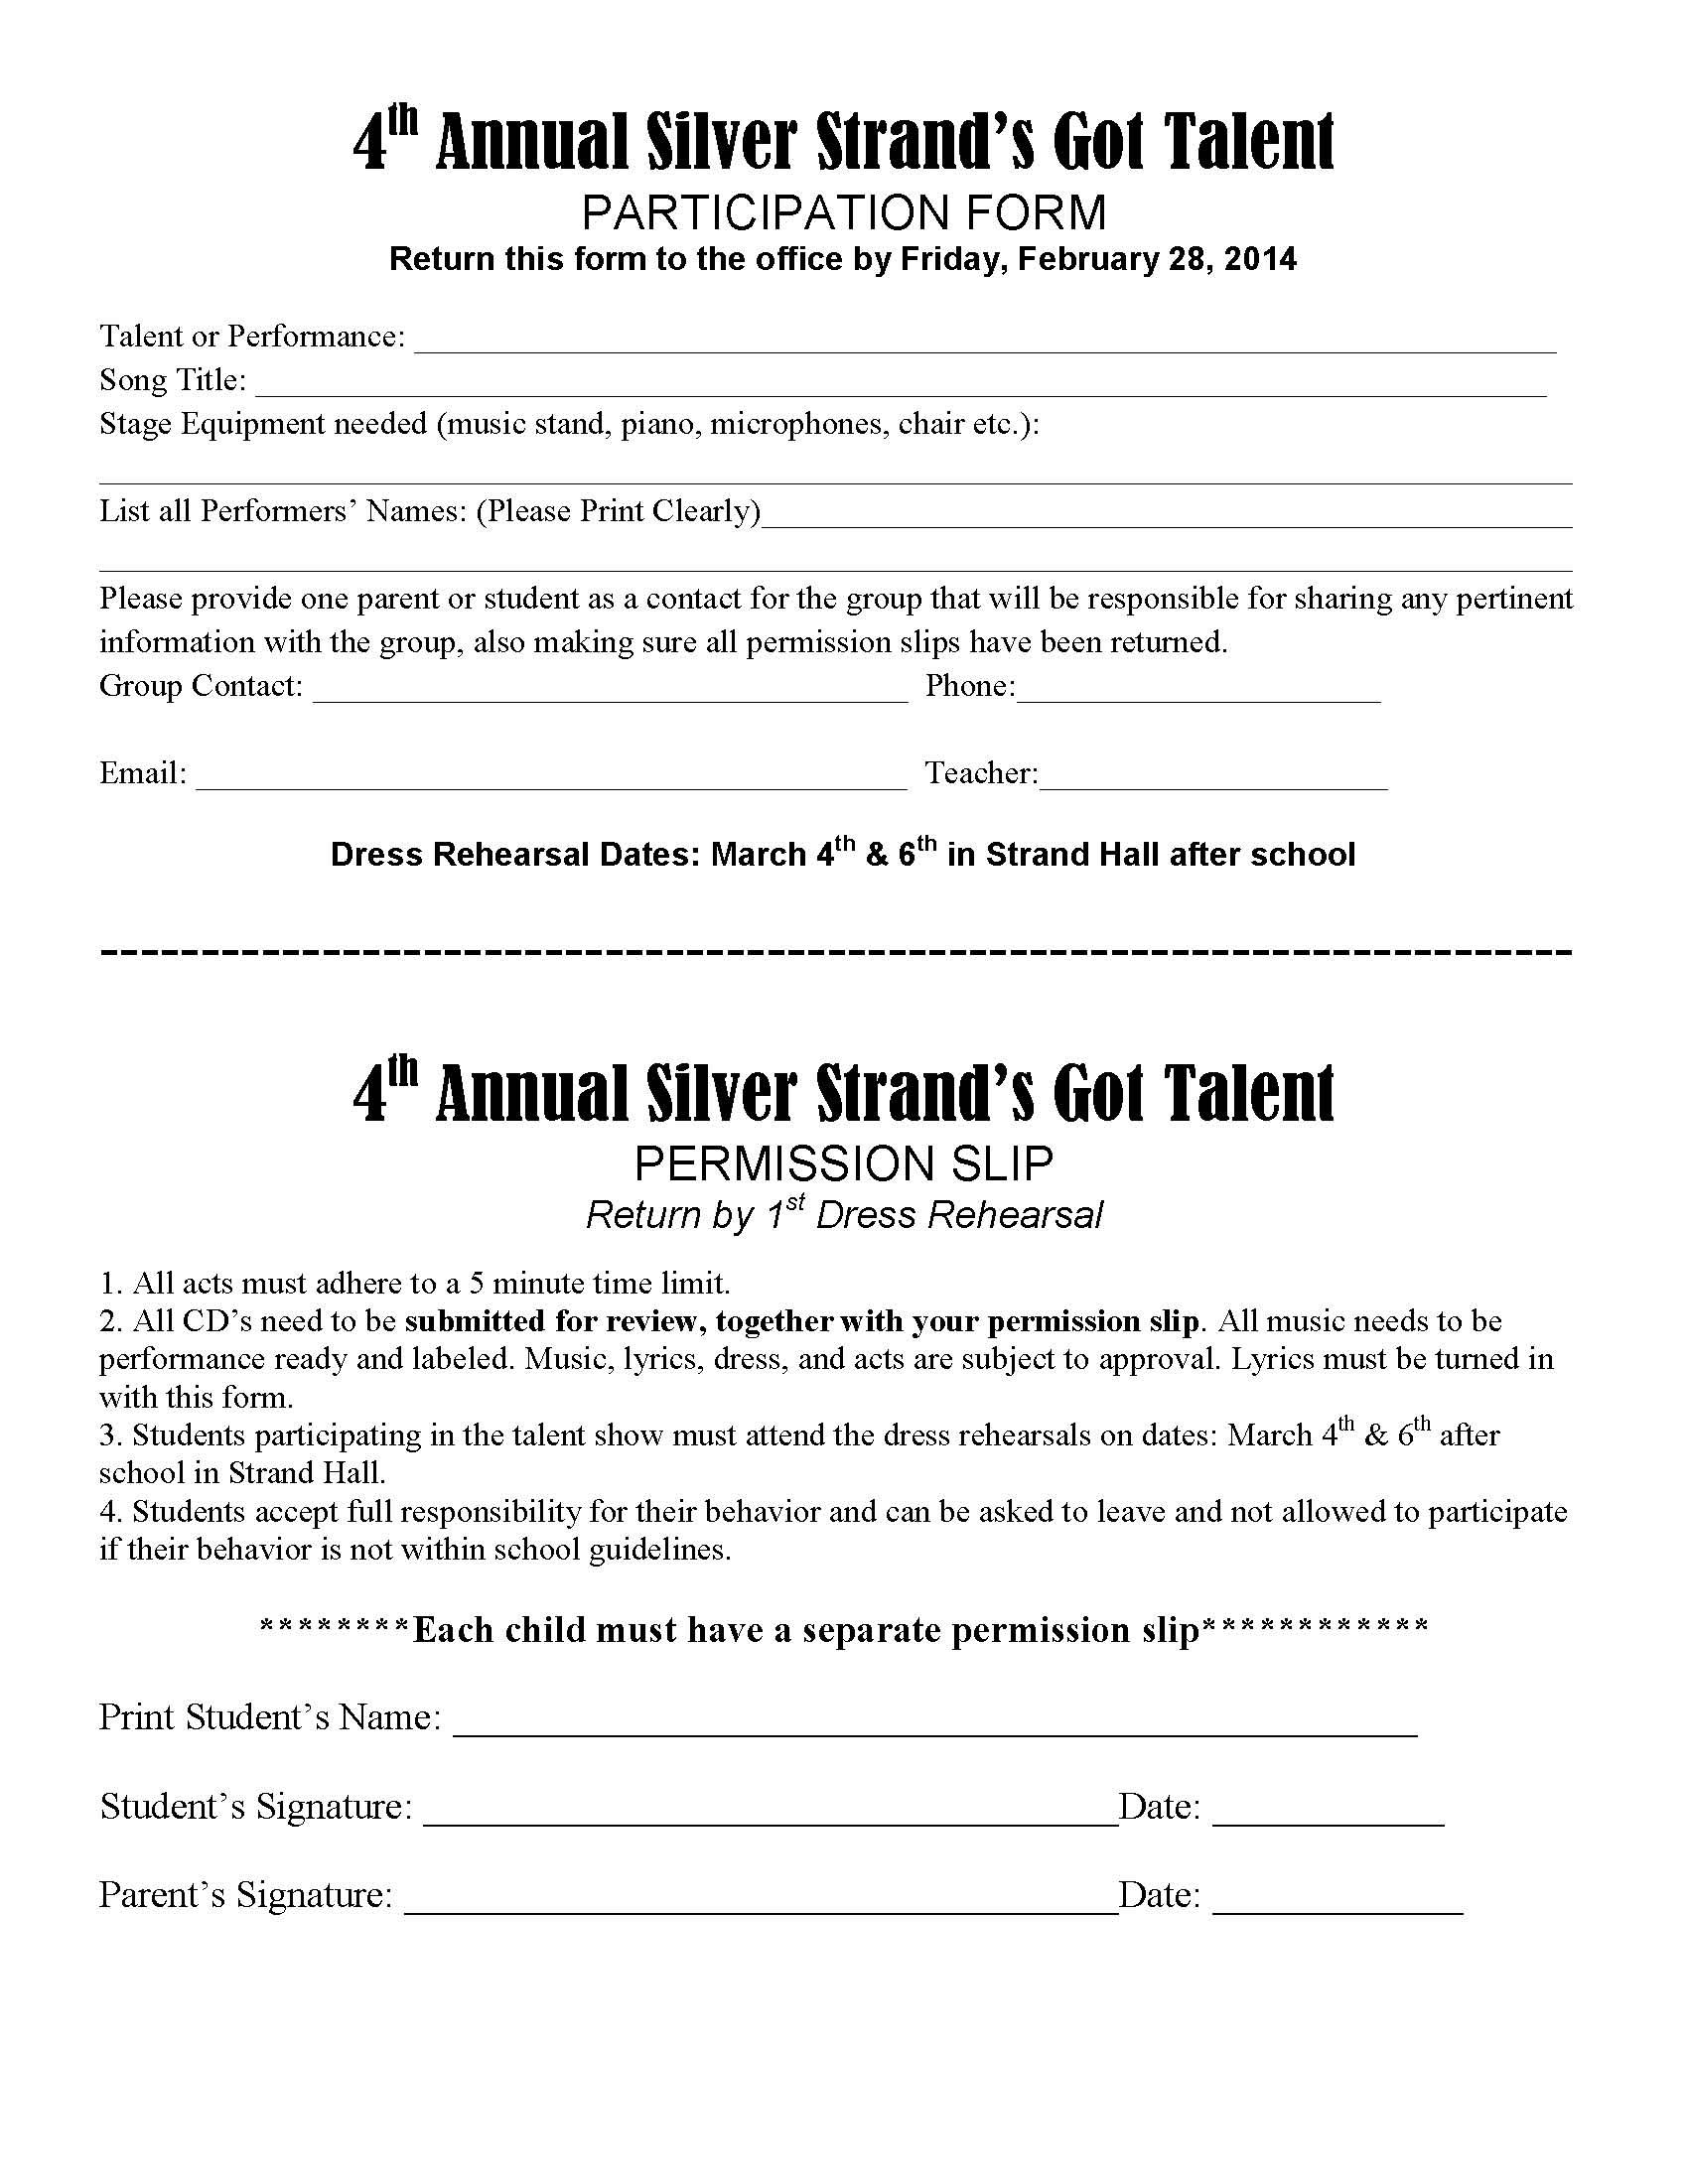 Silver Strand Elementary Talent Show Permission Slip